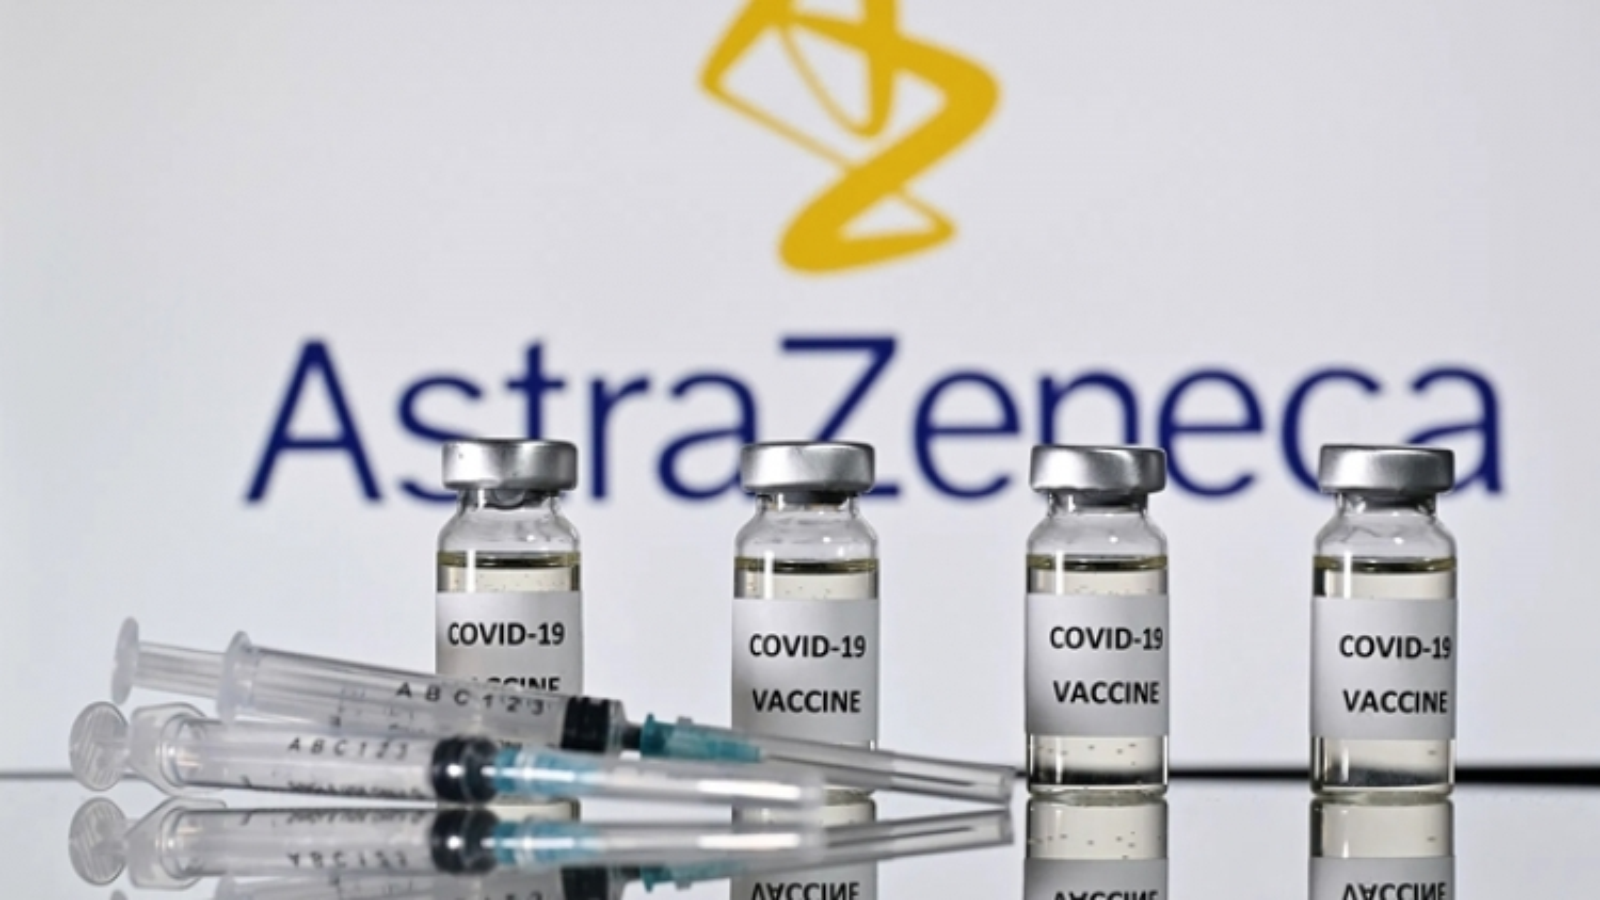 EU sẽ ngừng mua vaccine ngừa Covid-19 của AstraZeneca